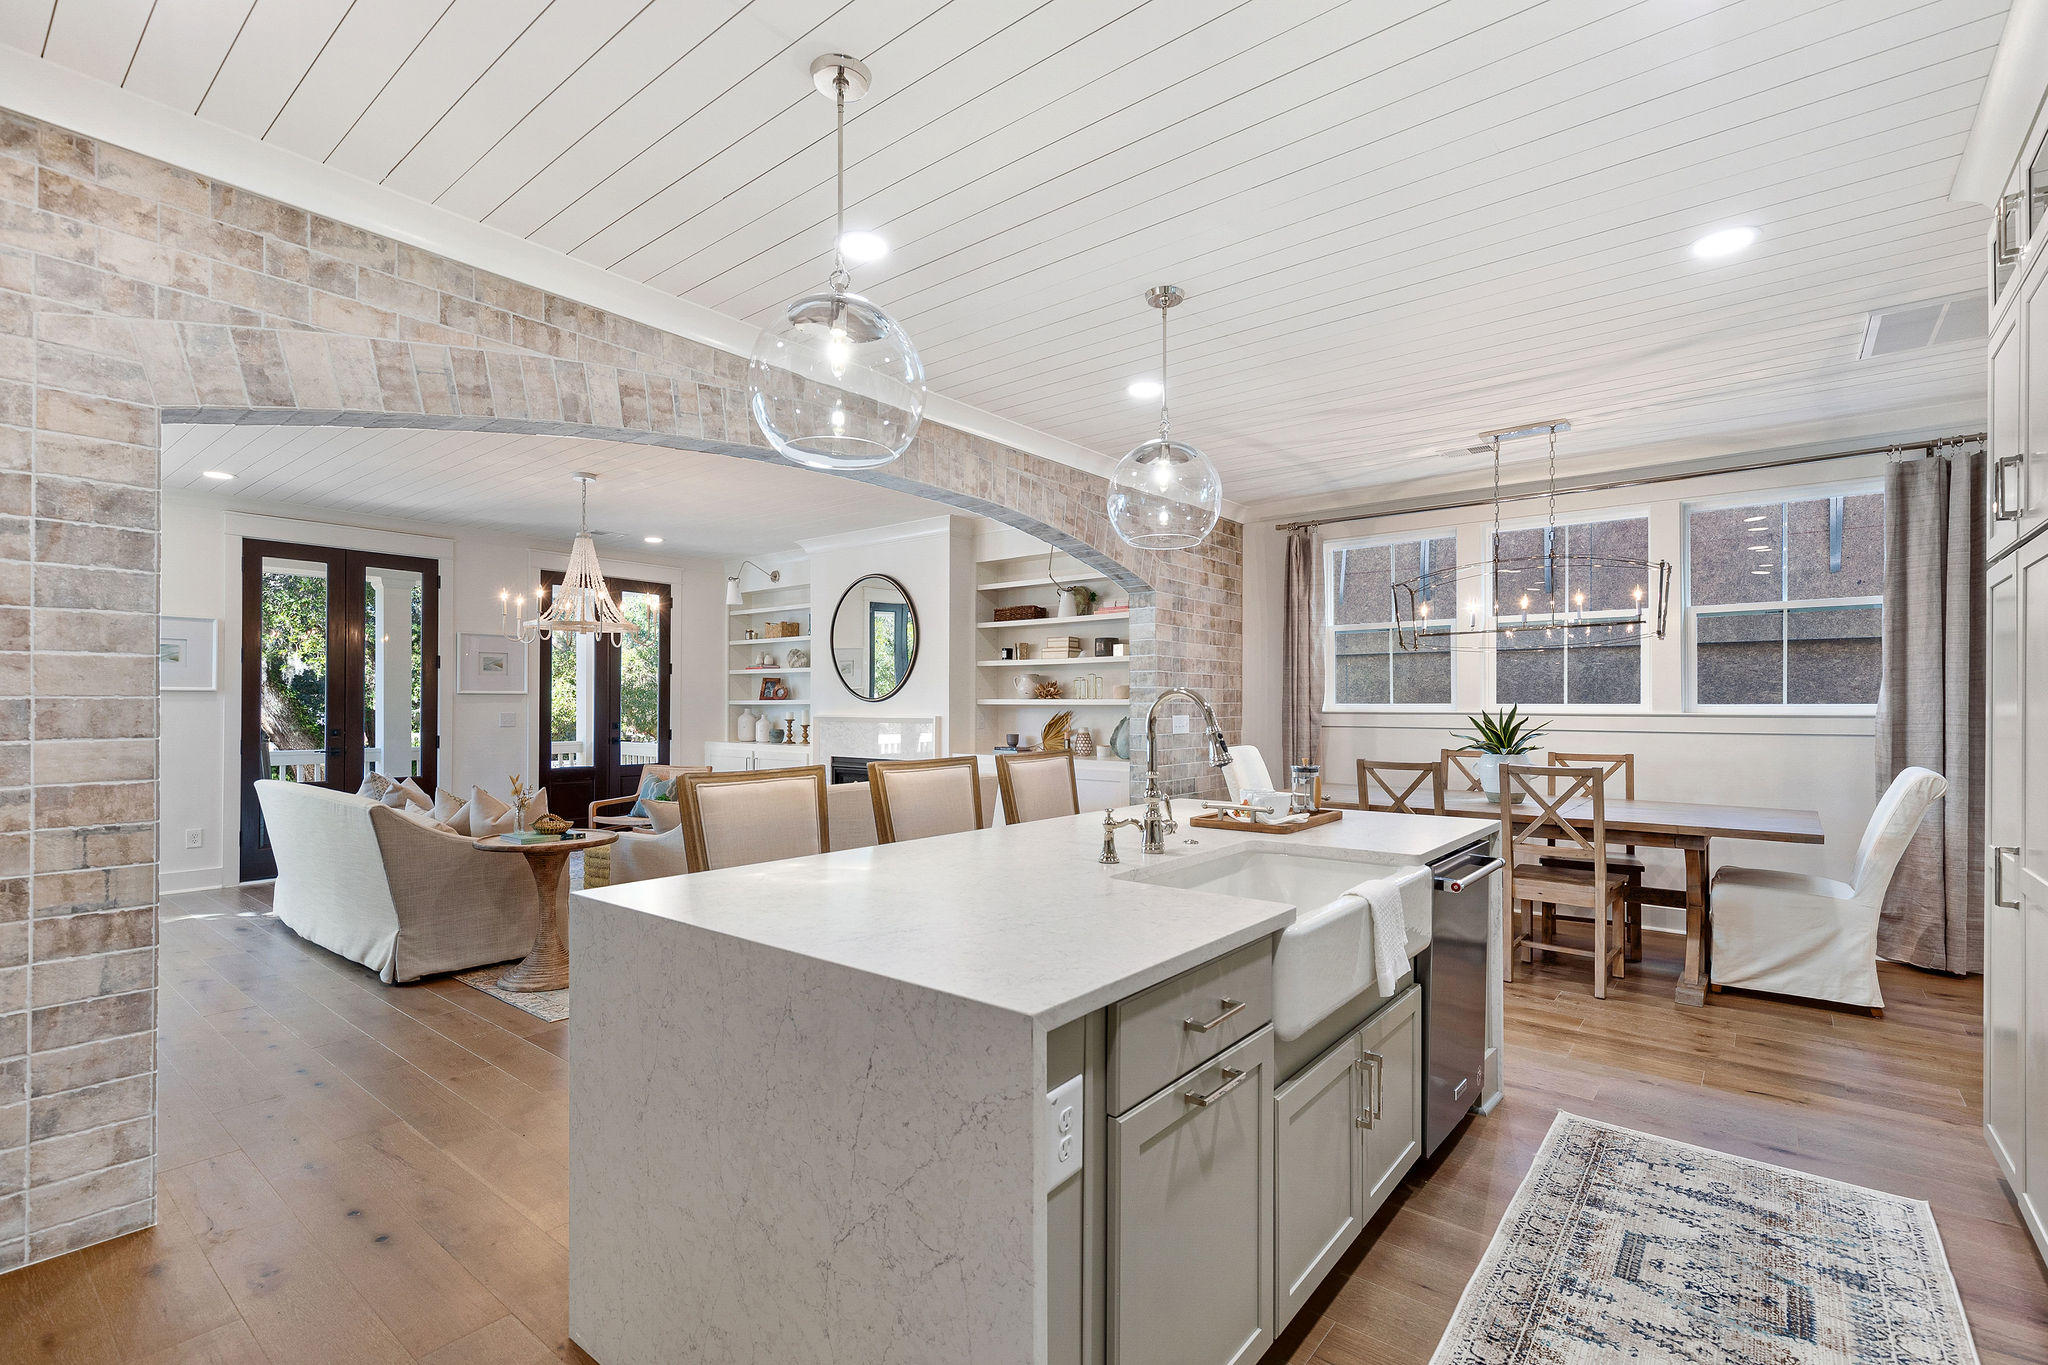 Avenue of Oaks Homes For Sale - 1027 Avenue Of Oaks, Charleston, SC - 35